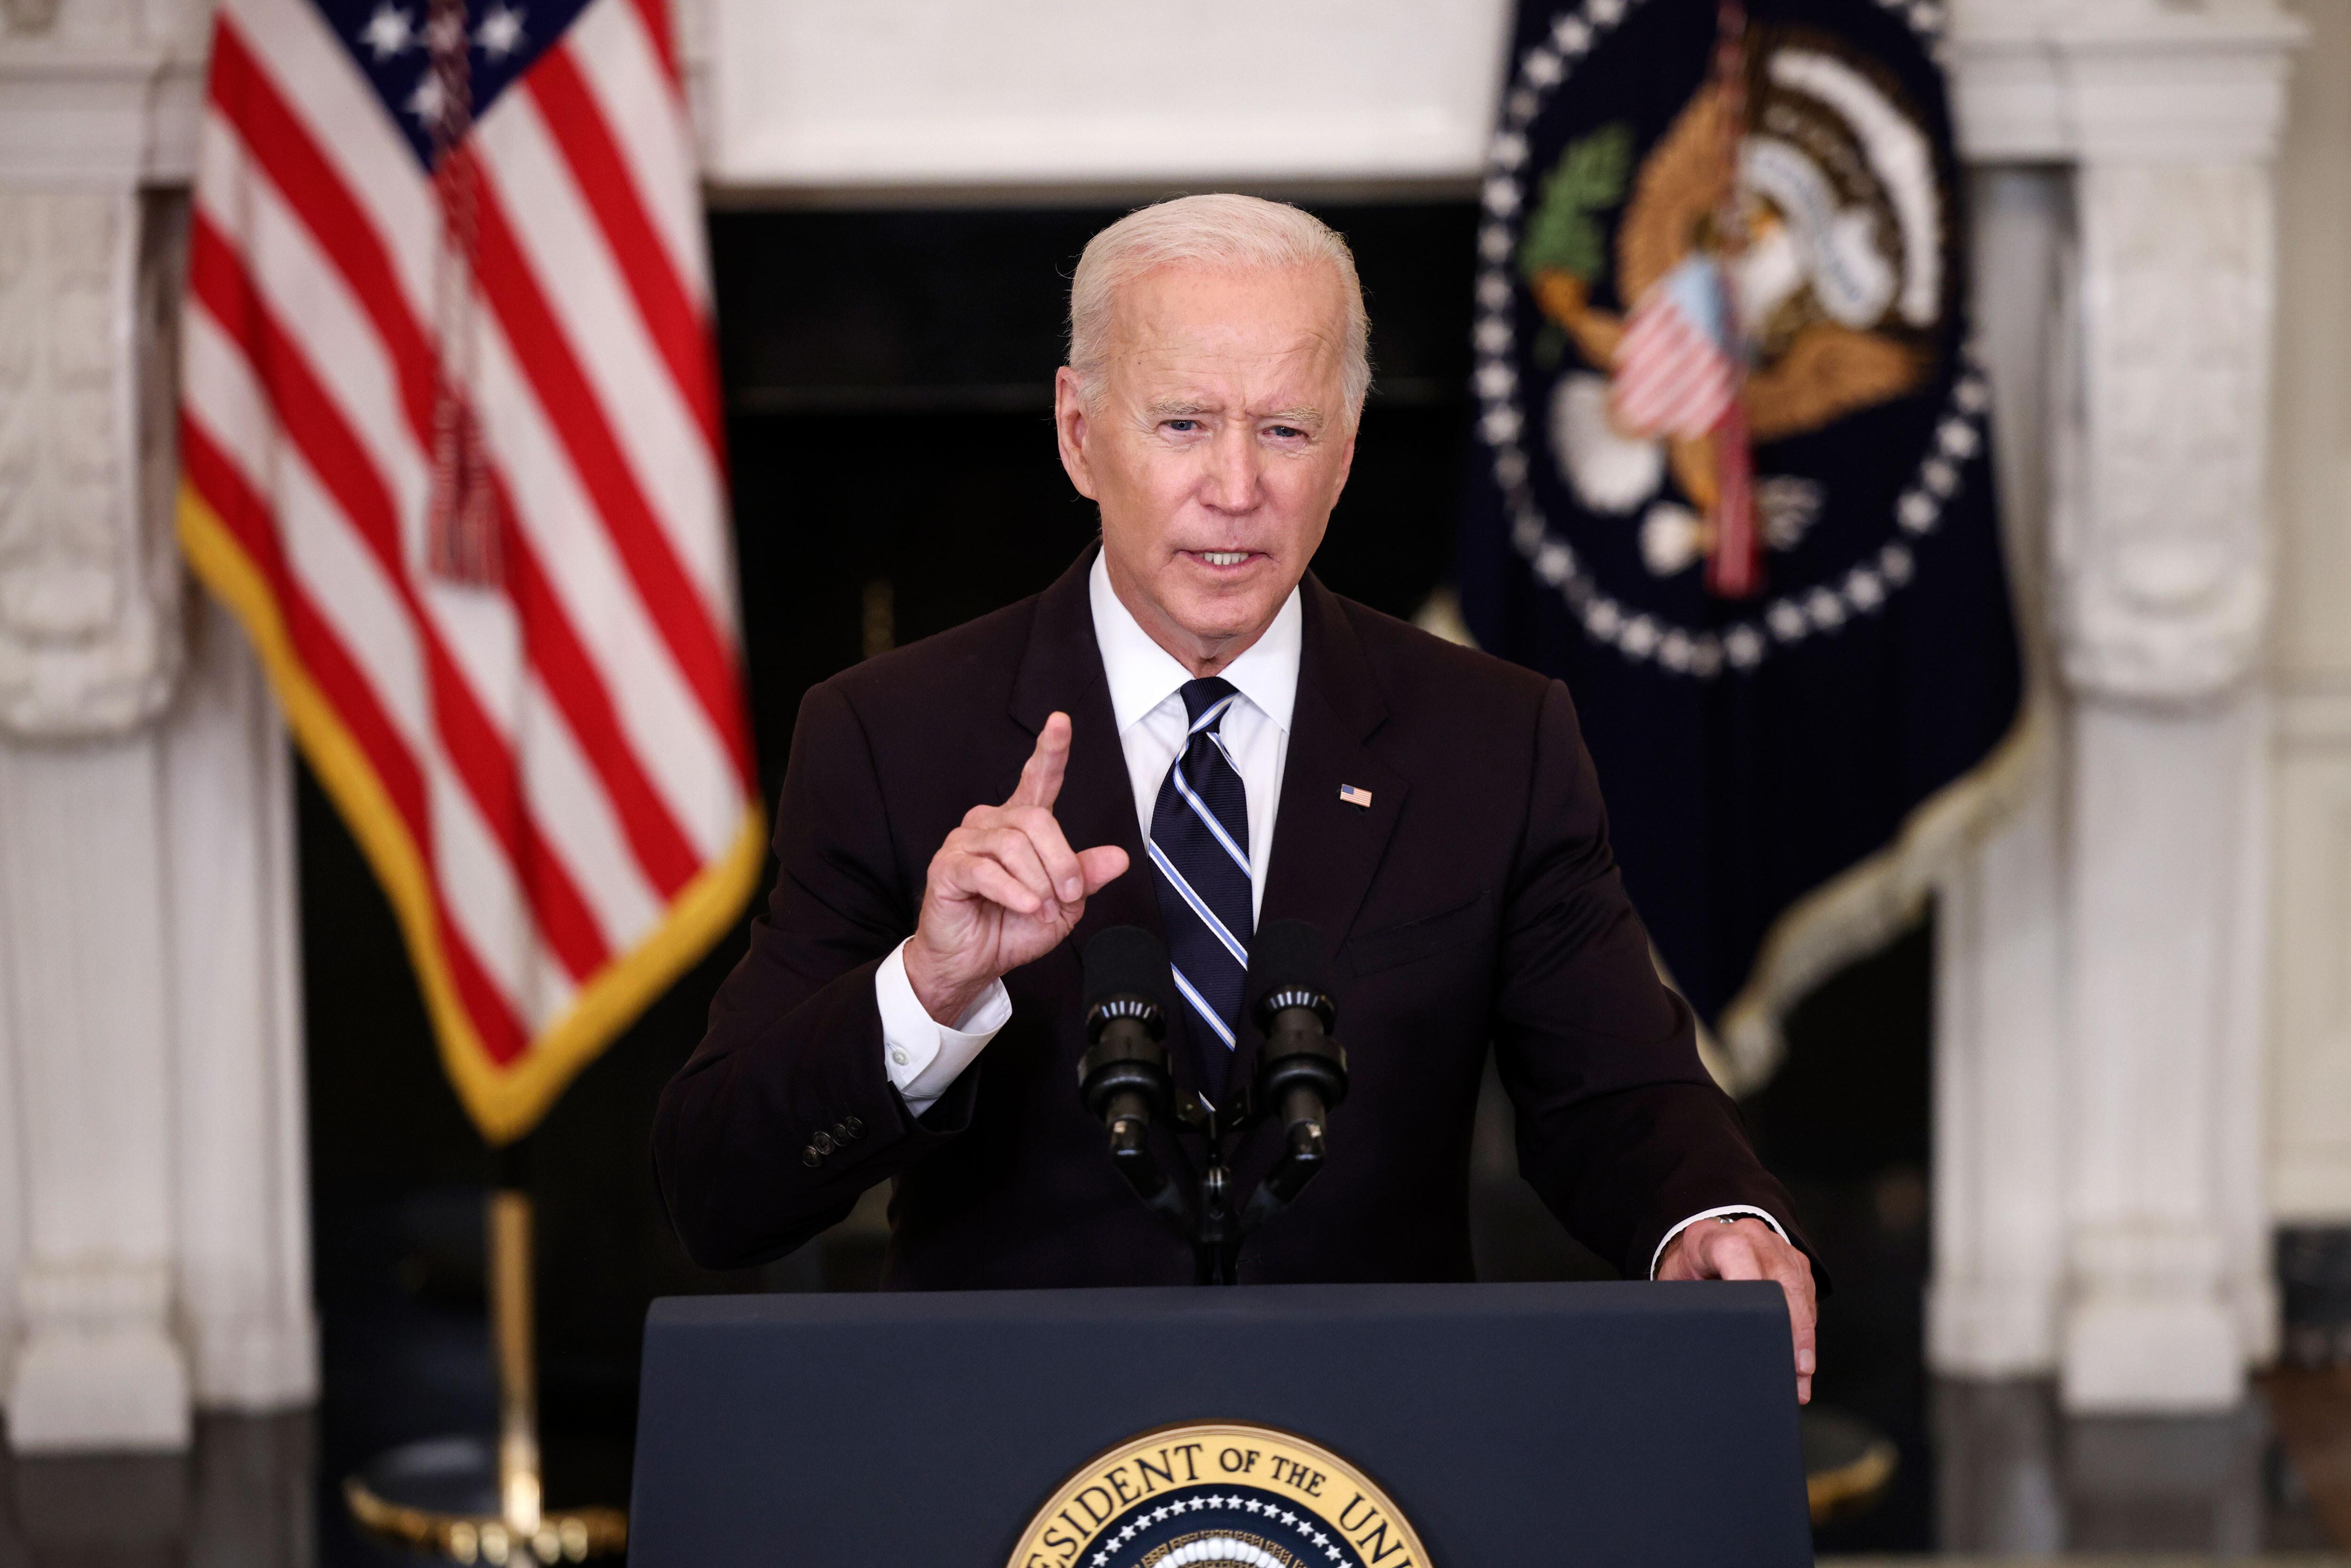 'Show some respect:' Biden blasts travelers who harass flight attendants over face masks